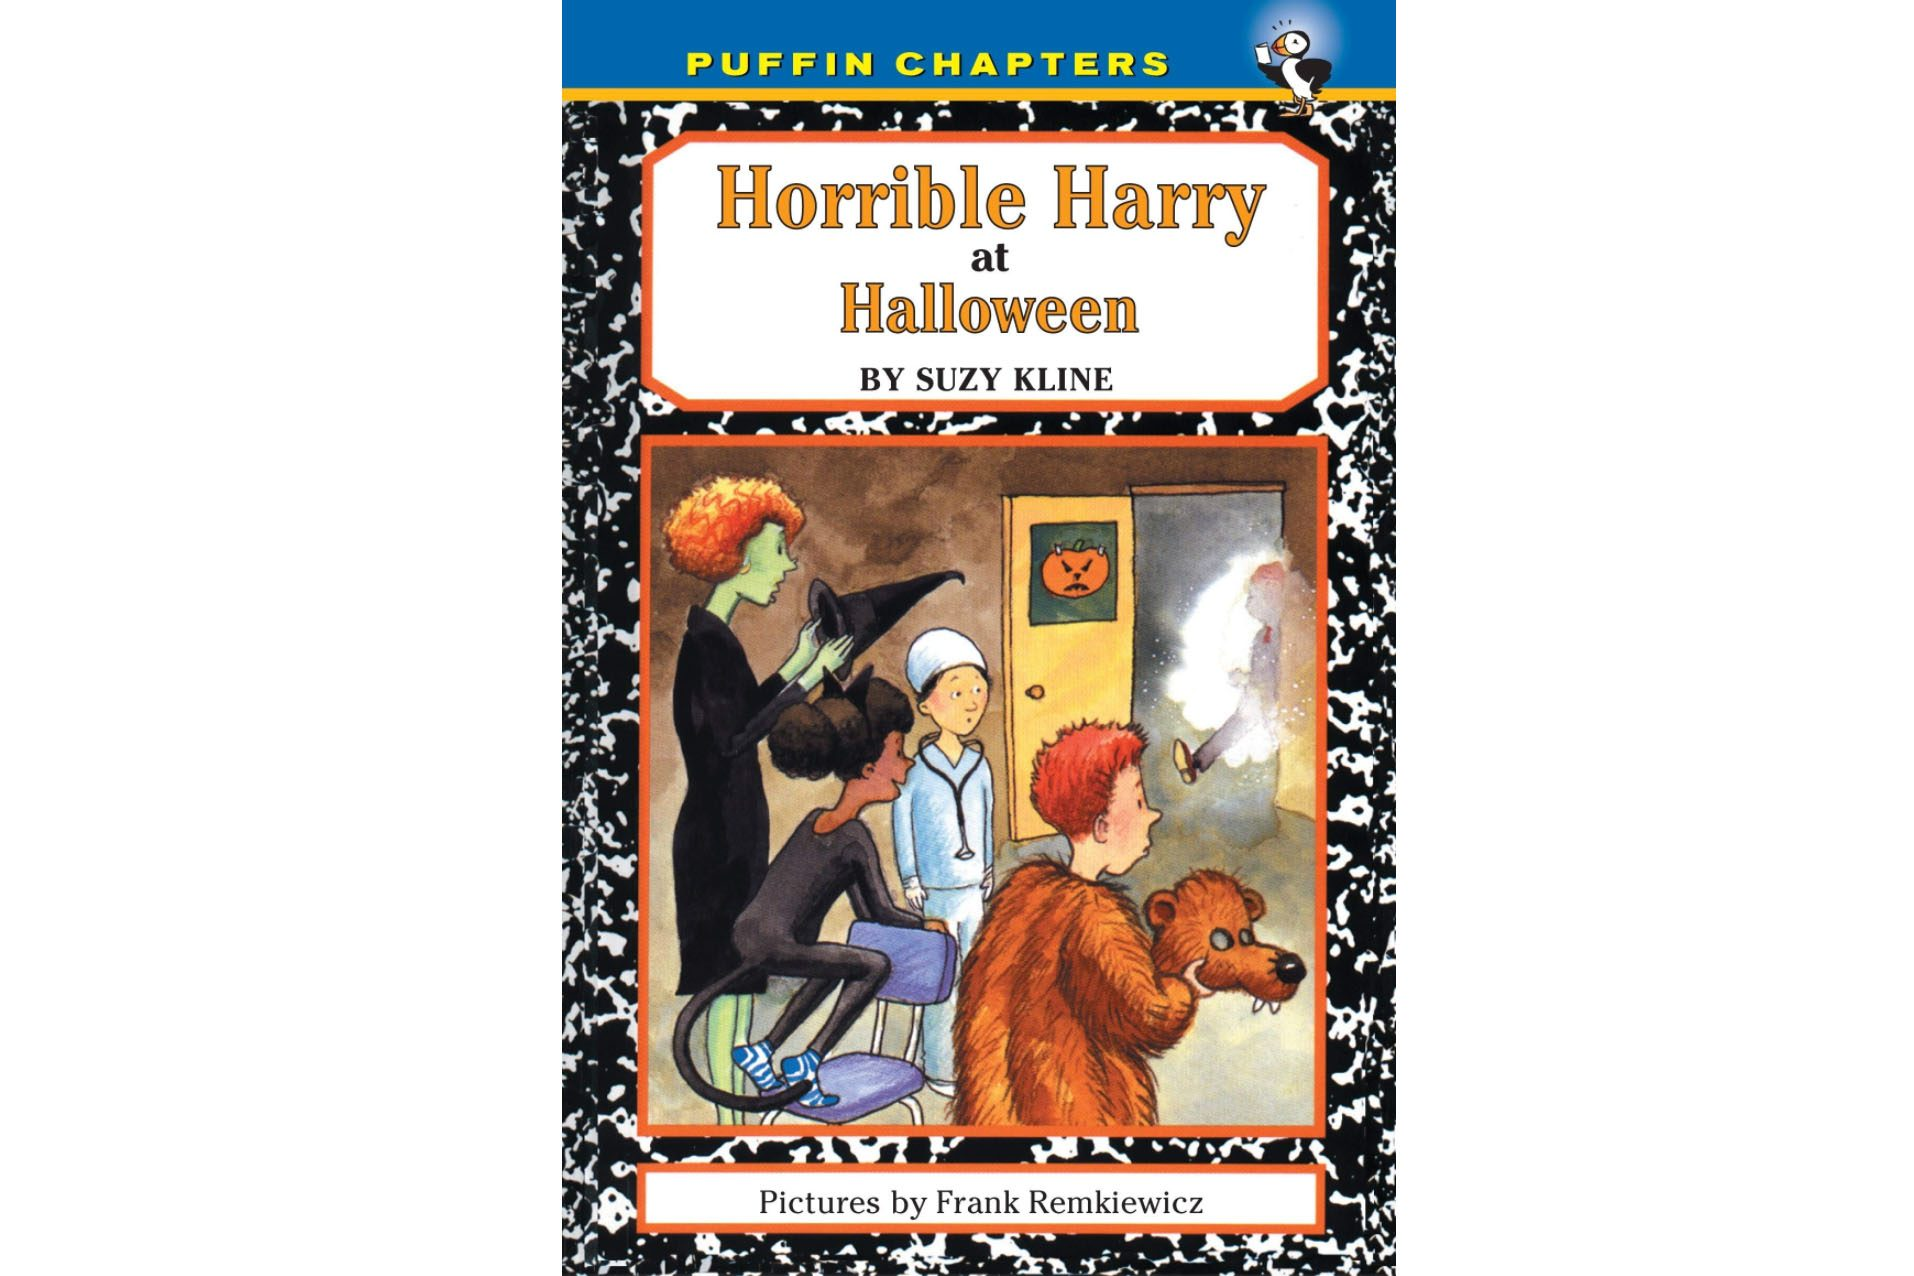 Horrible Harry at Halloweenby Suzy Kline